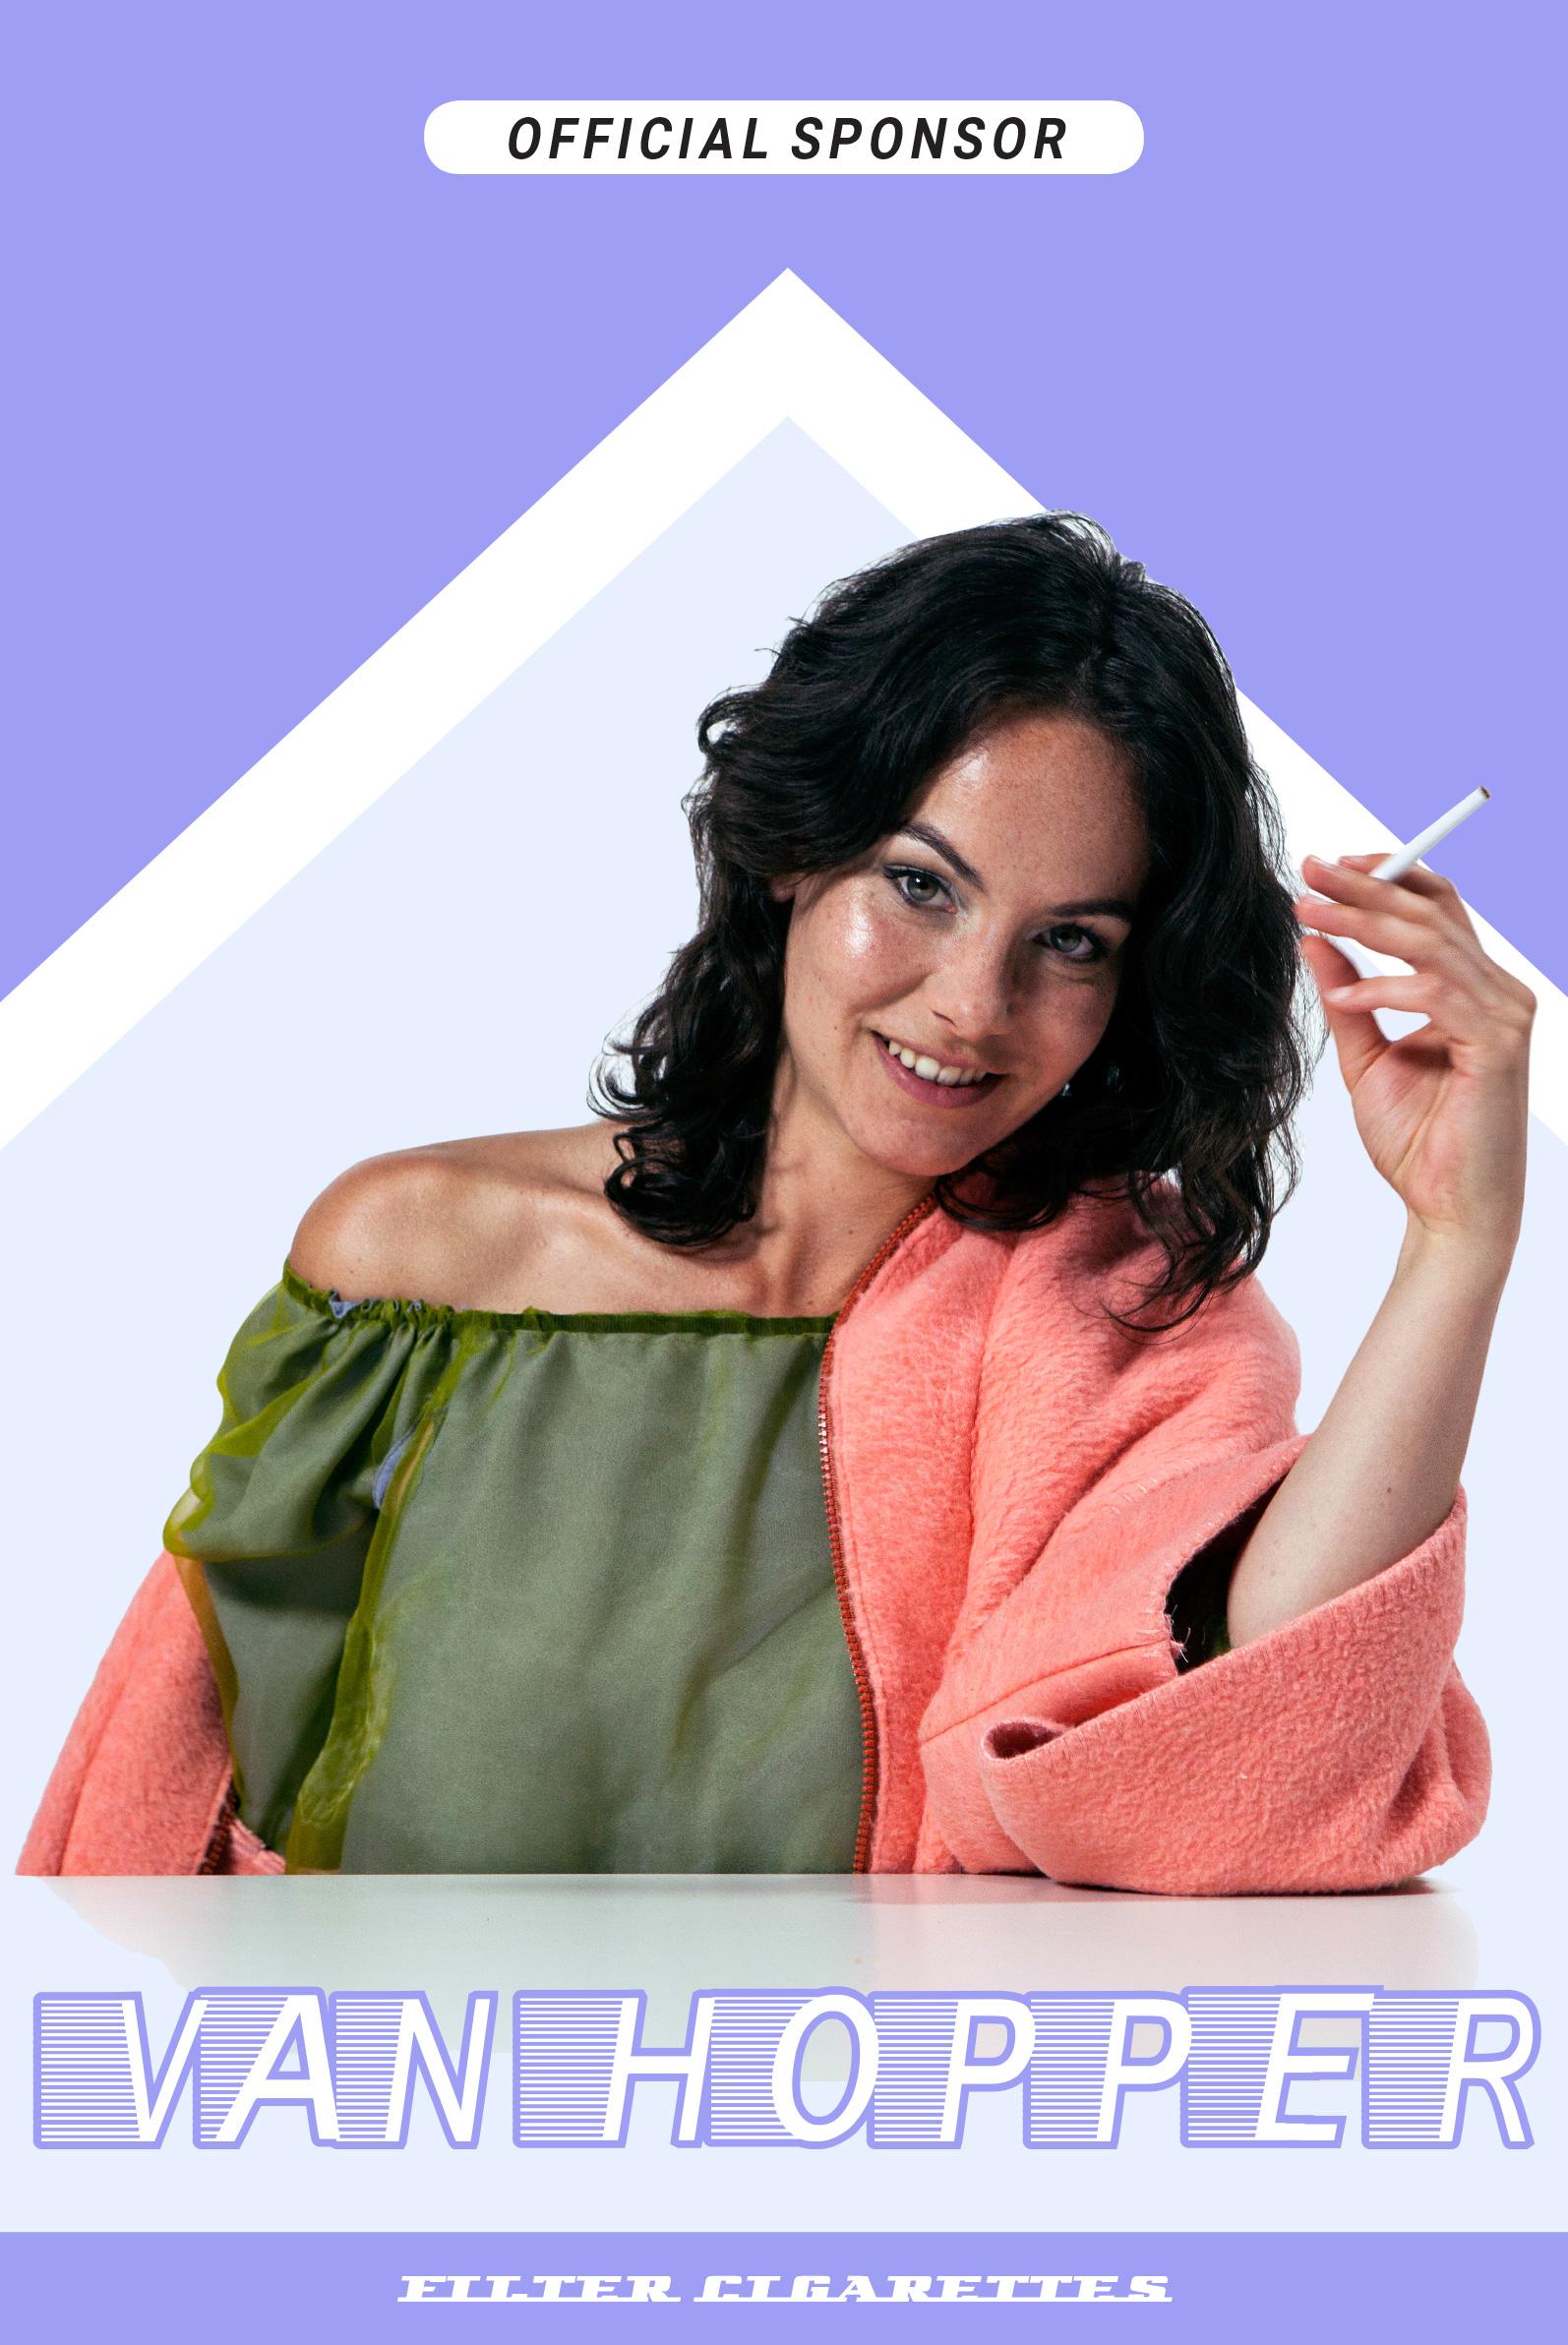 Van Hopper cigarettes, official sponsor fake advertising, Nina Britschgi